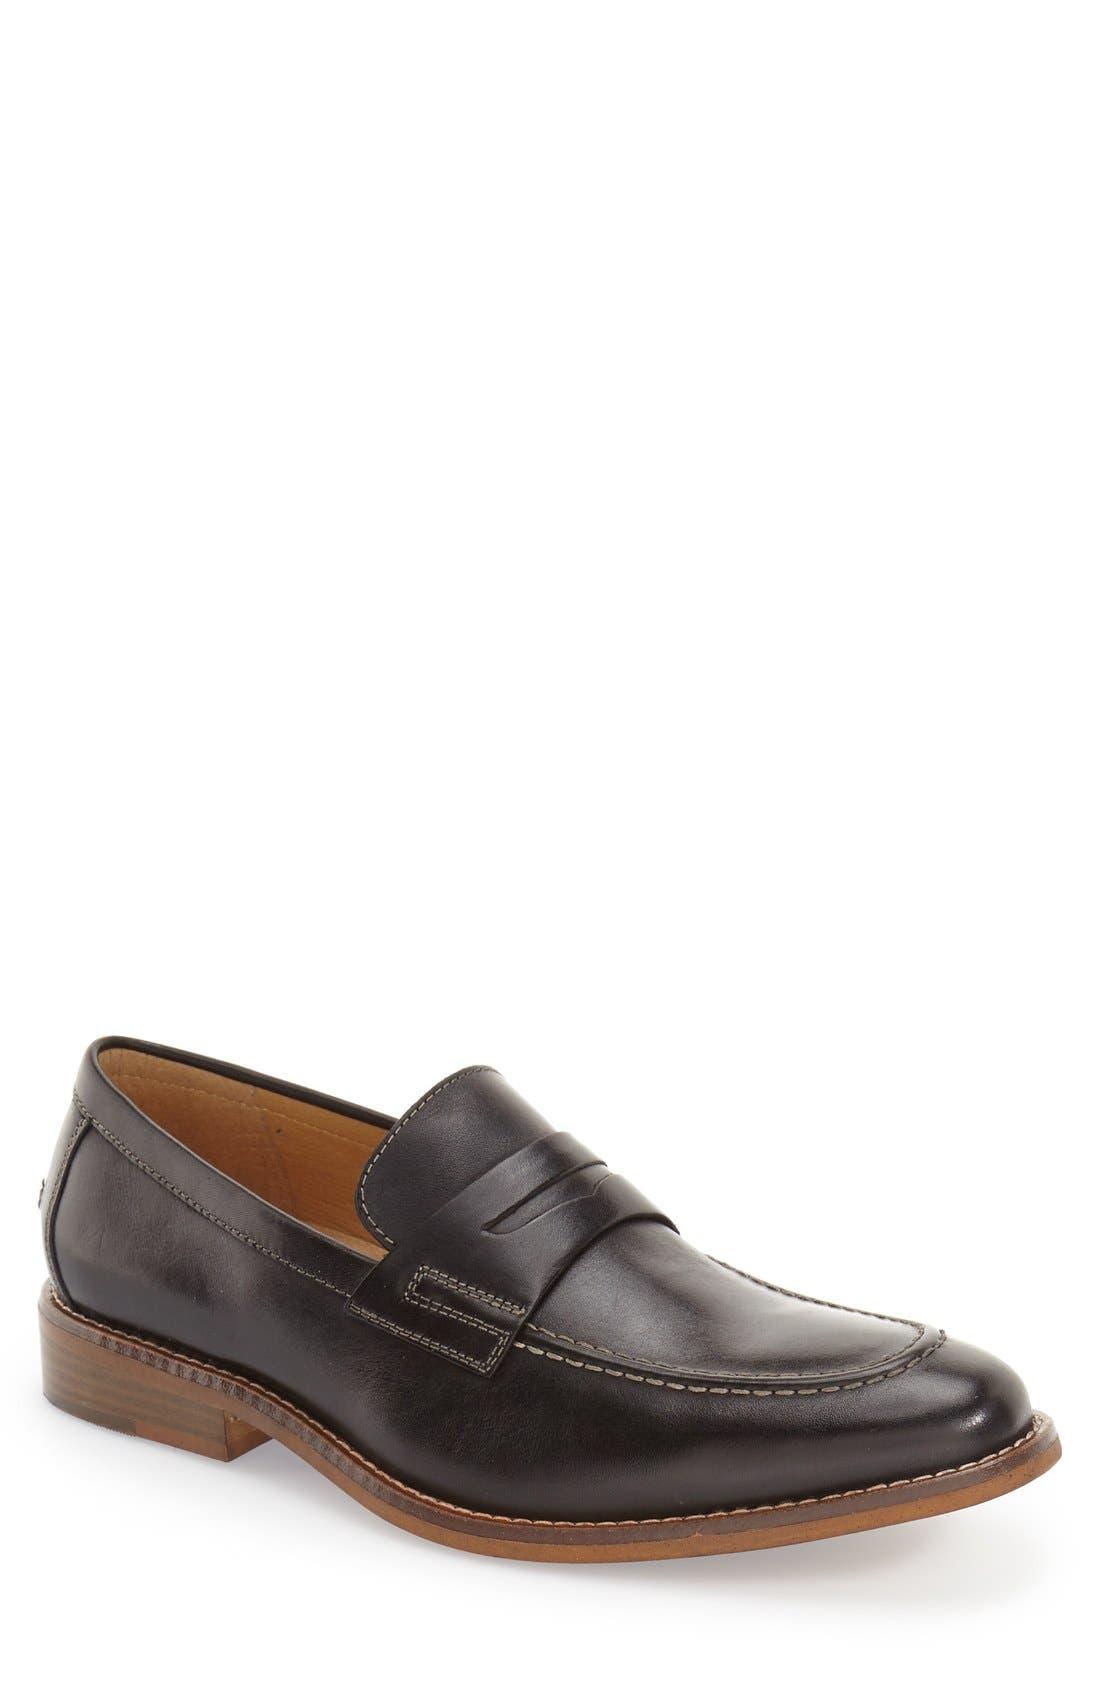 Men S Slip On Loafers Driving Shoes Amp Moccasins Nordstrom